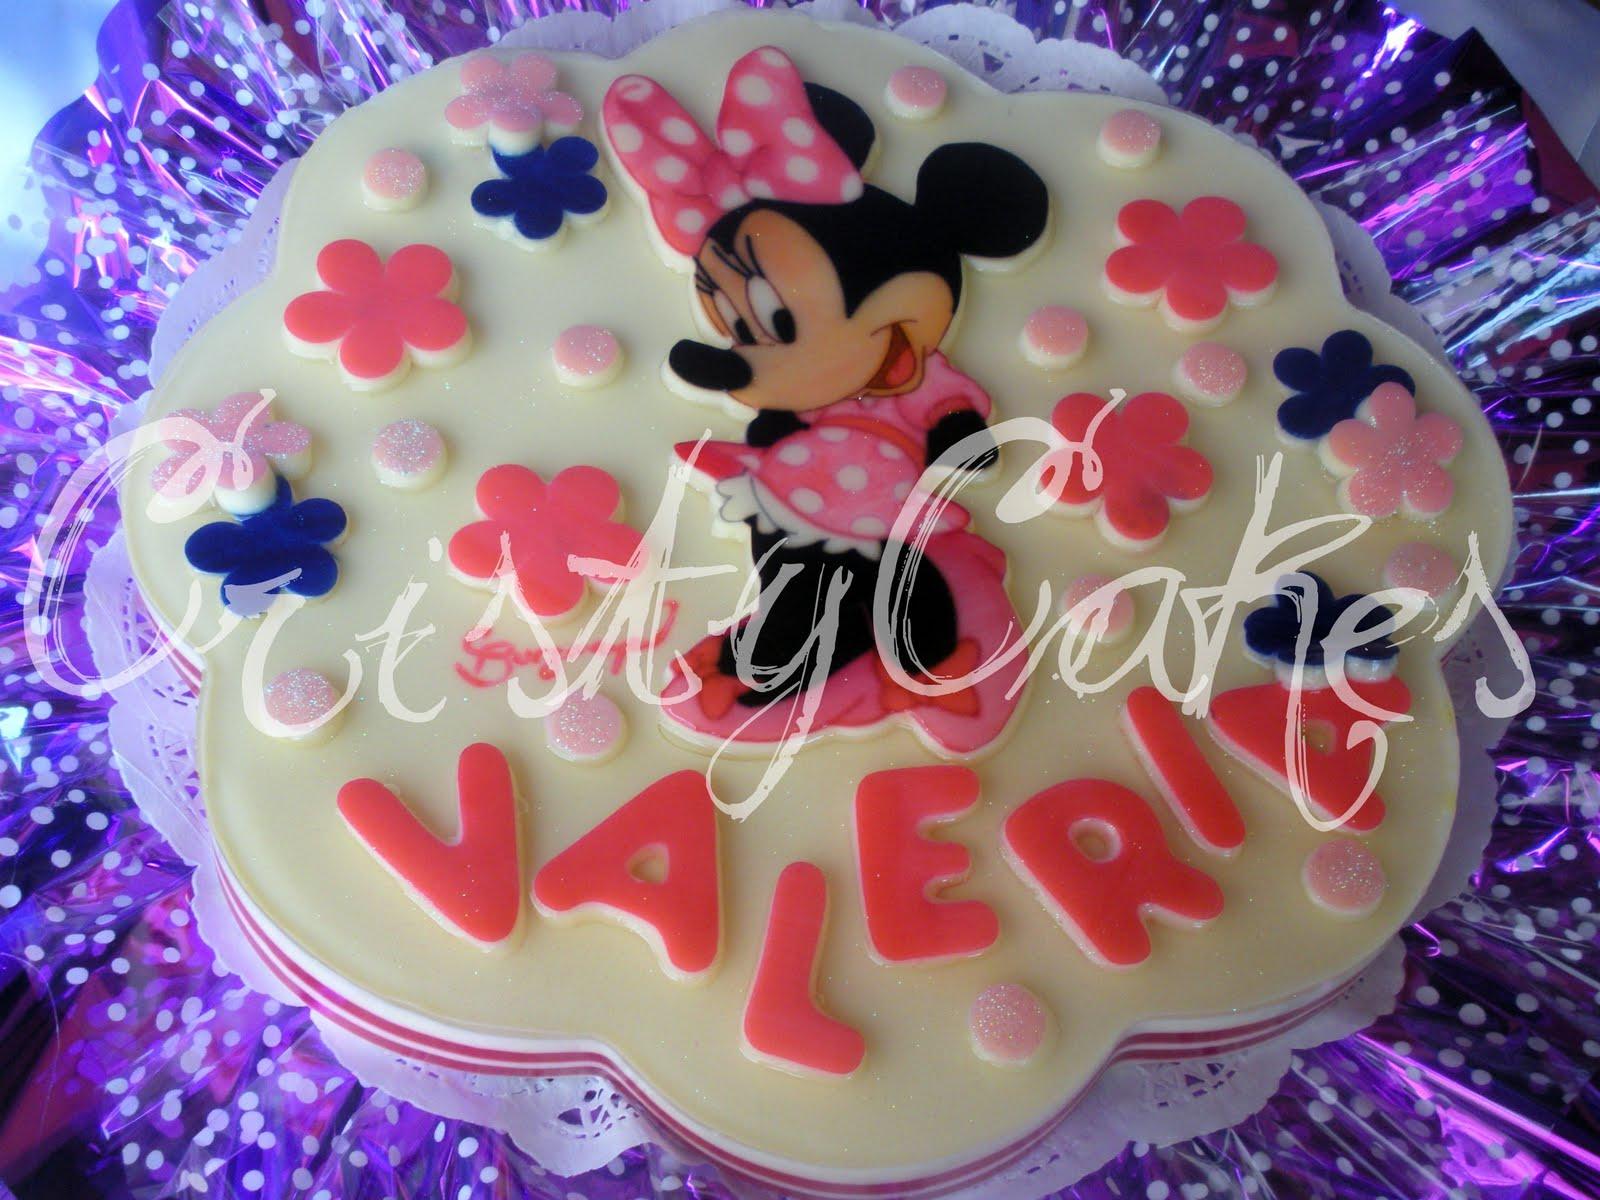 Gelatina de colores Minnie bebé mouse - Imagui